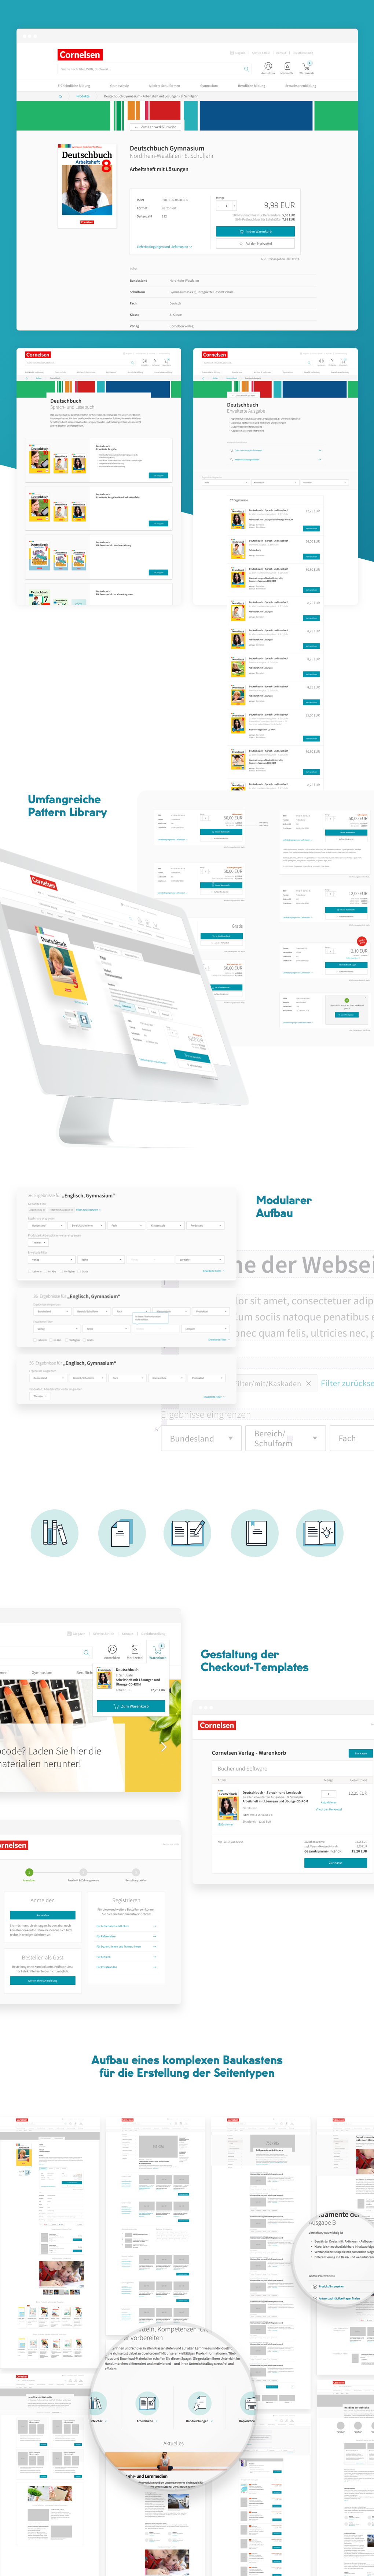 Cornelsen_Projektaufbereitung_StudioGOOD